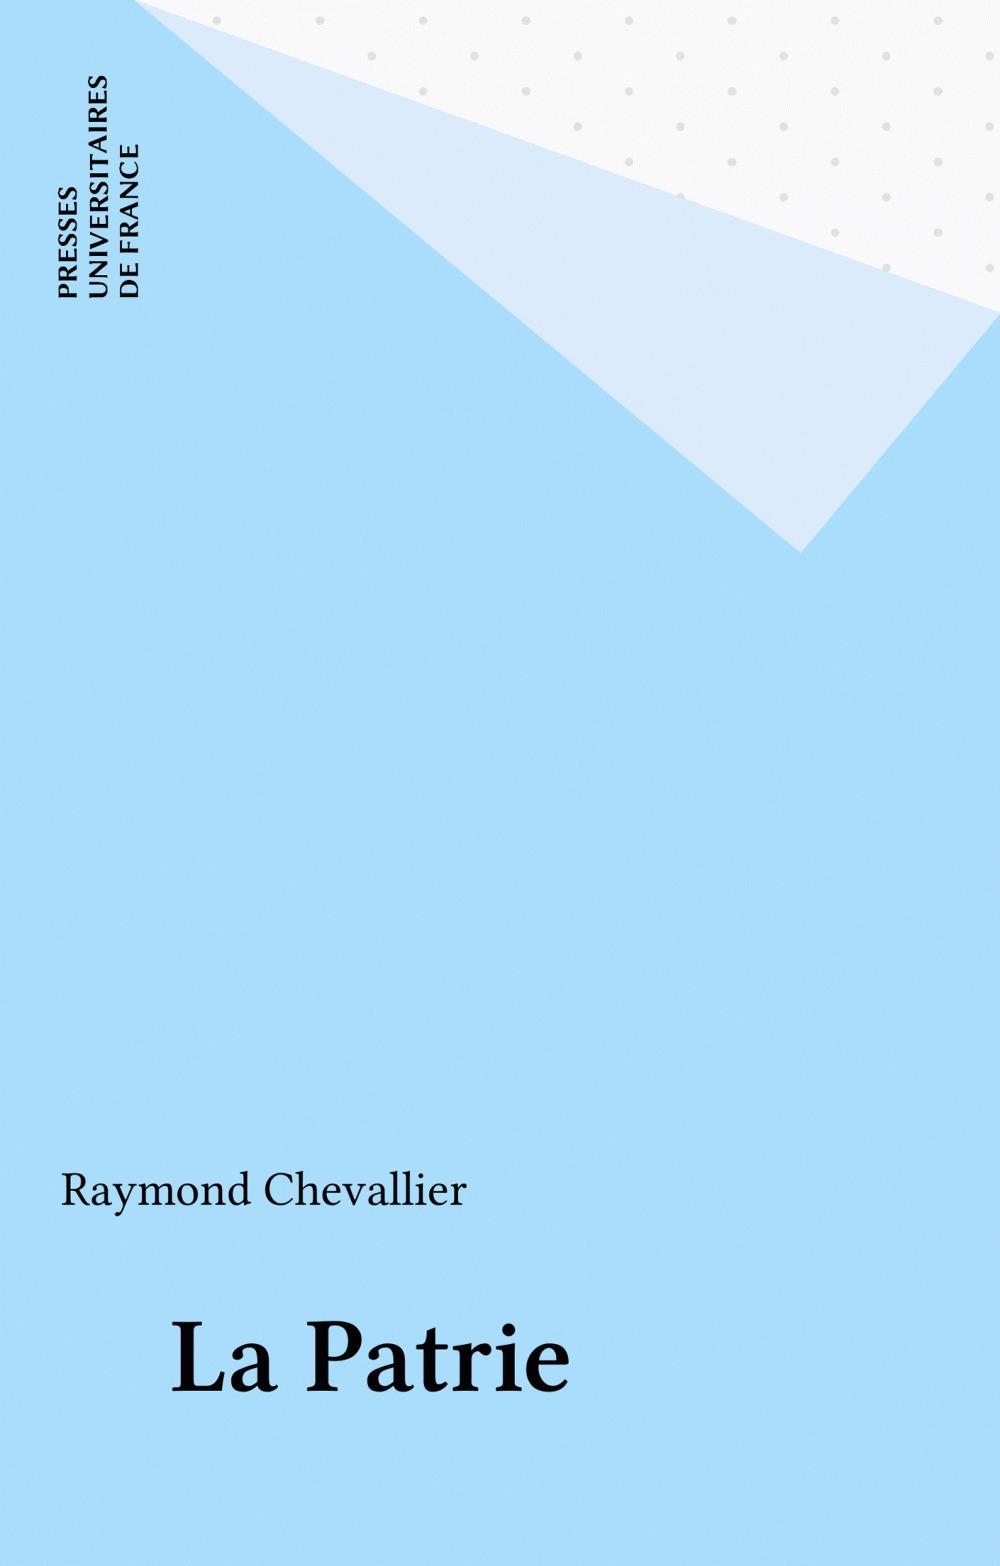 La patrie  - Chevallier R.  - Raymond Chevallier